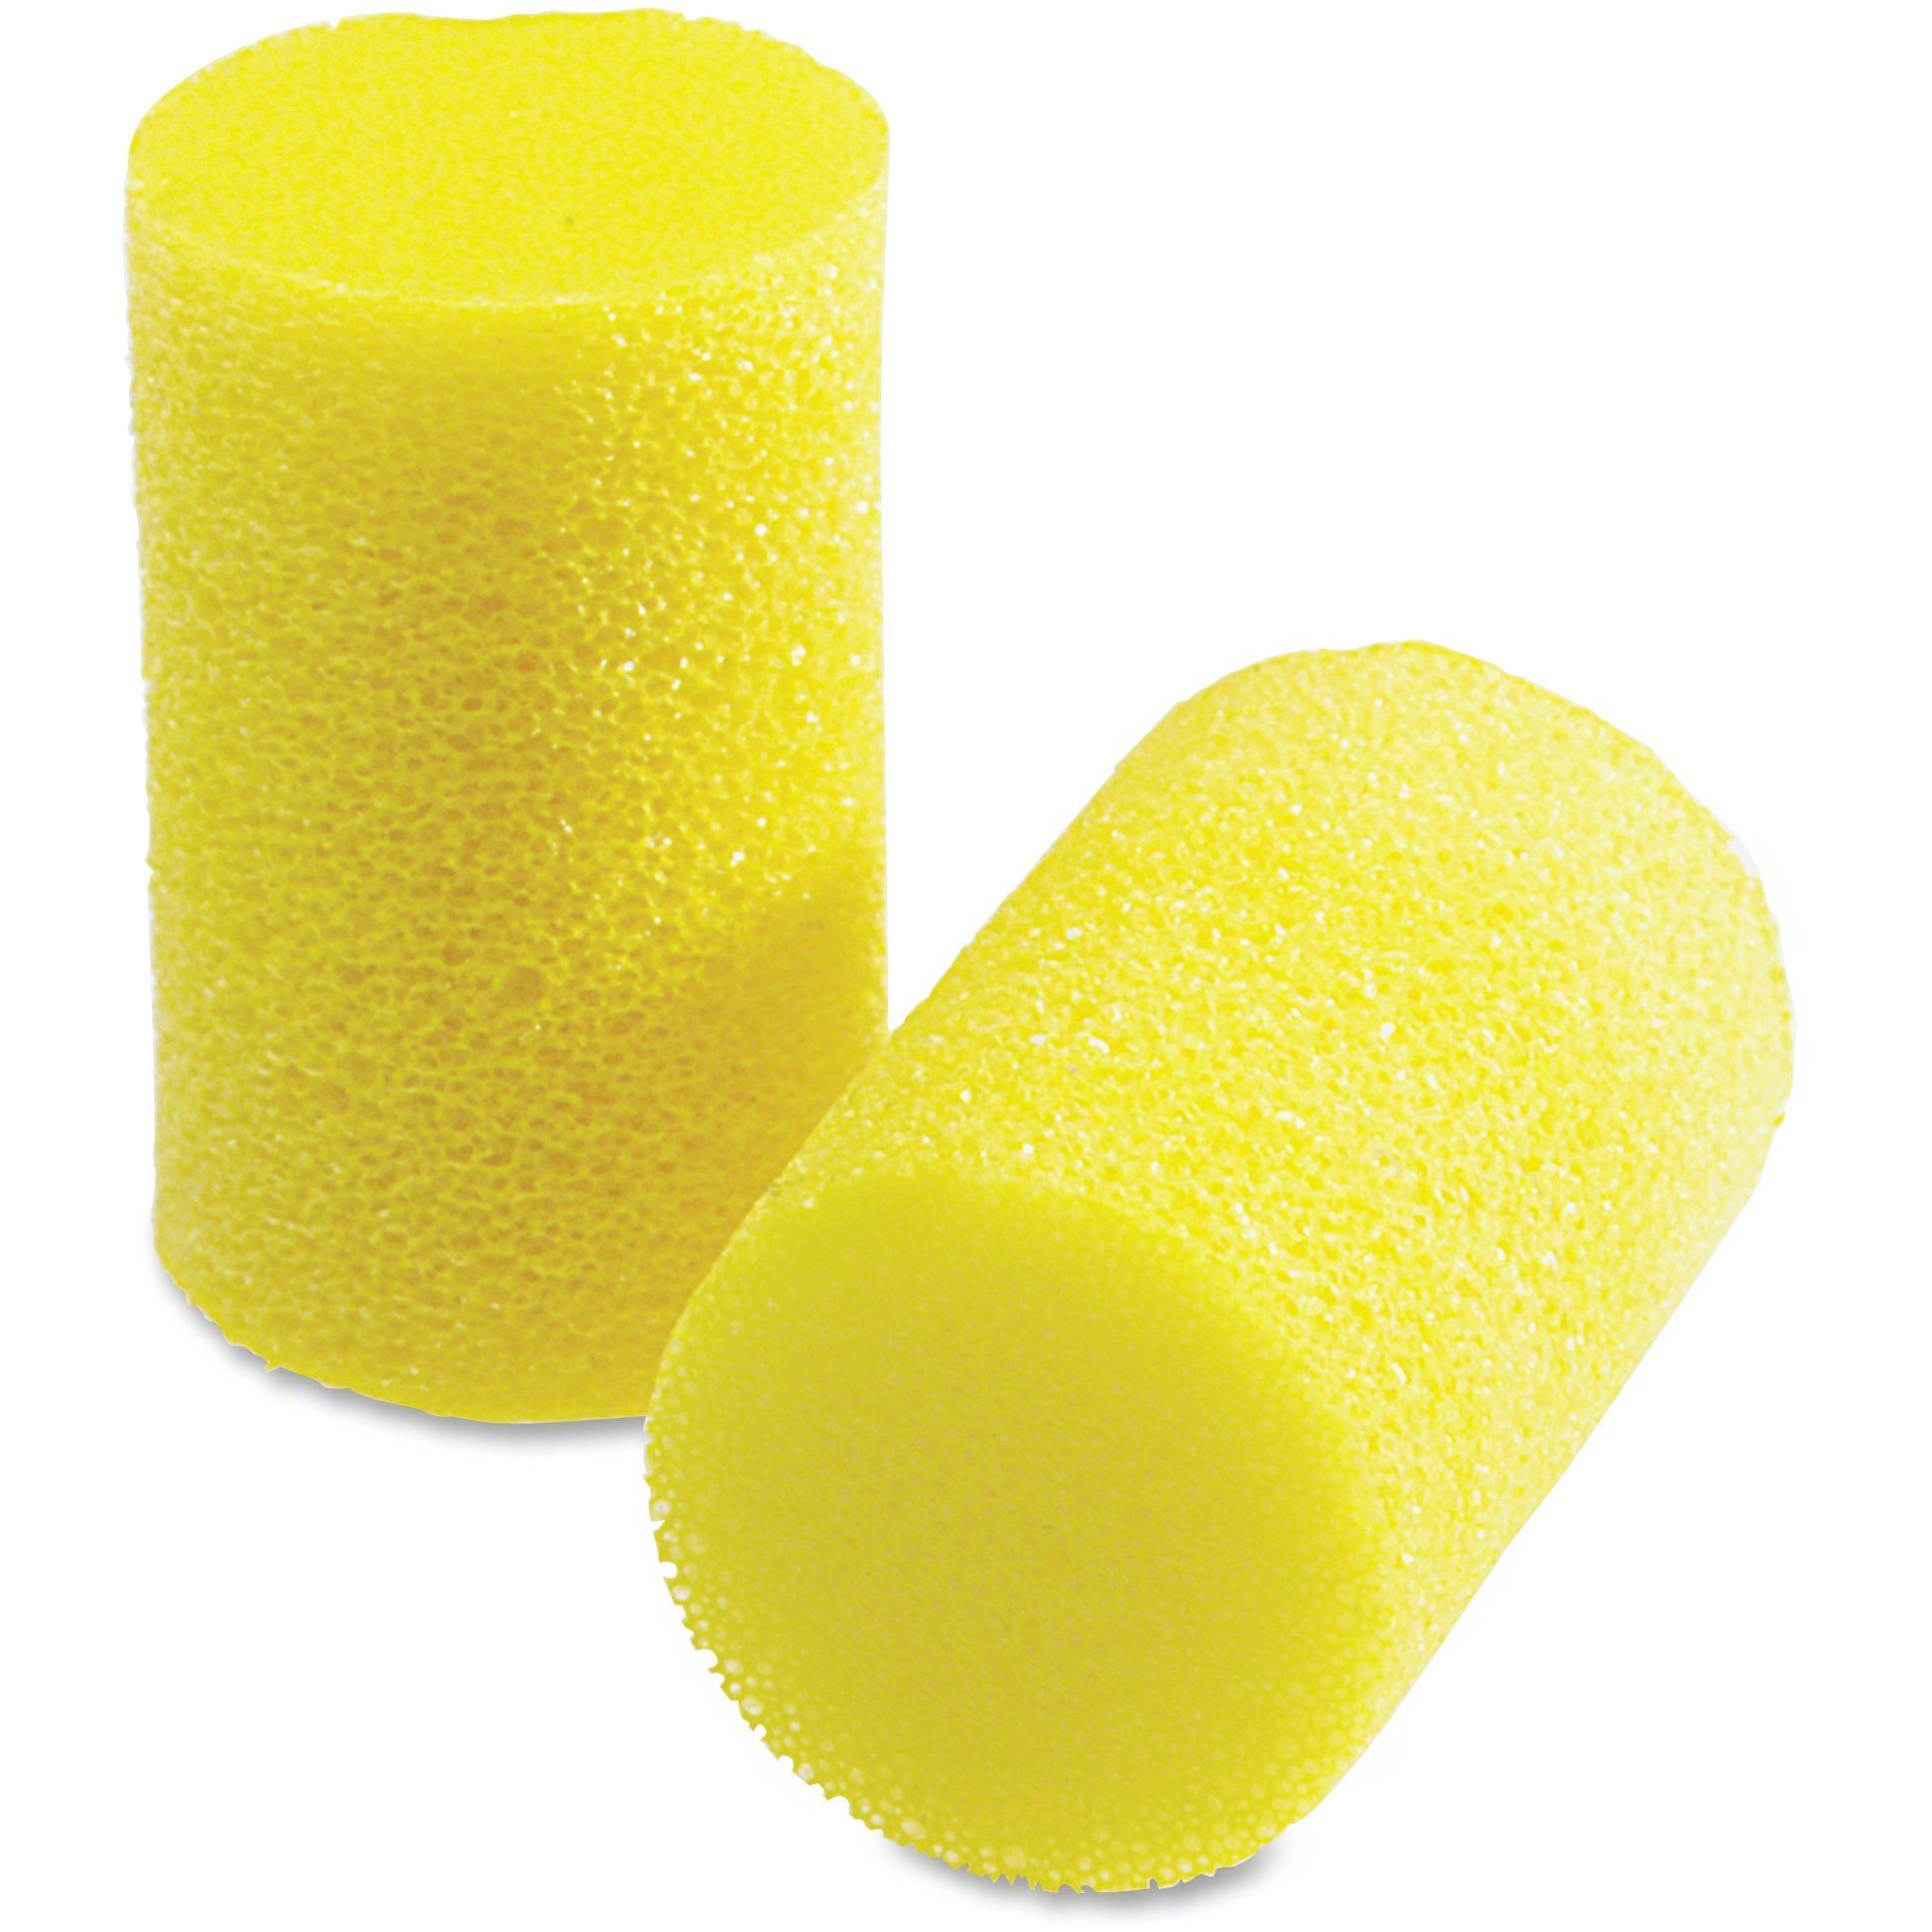 E-A-R, MMM3101103, Classic Uncorded Earplugs, 200 / Box, Yellow